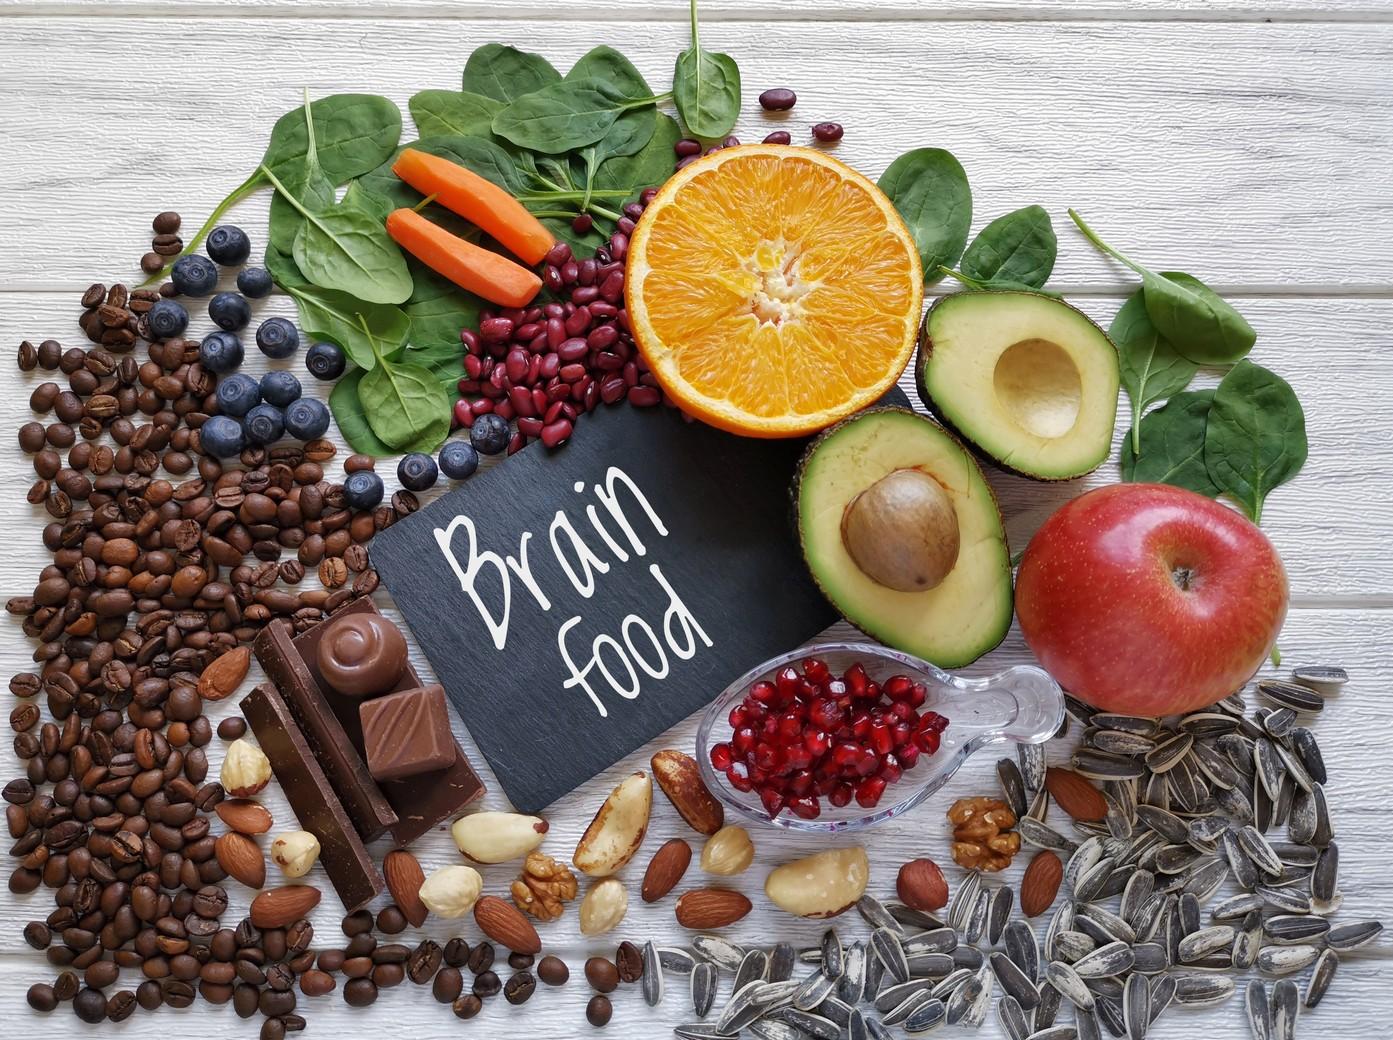 San Francisco Bay Area Healthy Vending   Healthy Breakfast Products   Alternative Snack Choices